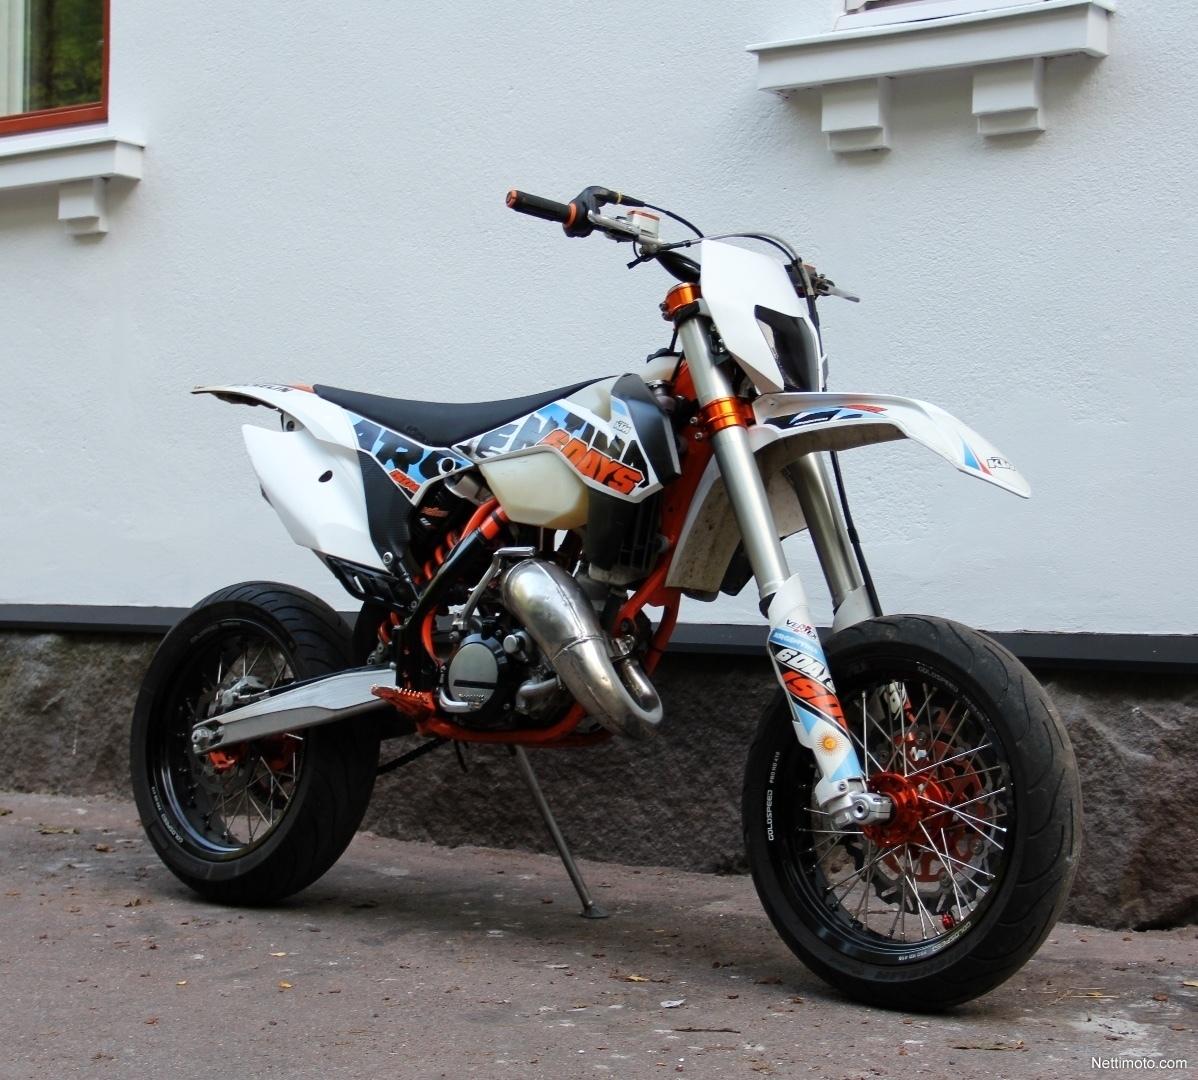 KTM 125 EXC SIXDAYS 125 cm³ 2015 - Turku - Motorcycle - Nettimoto